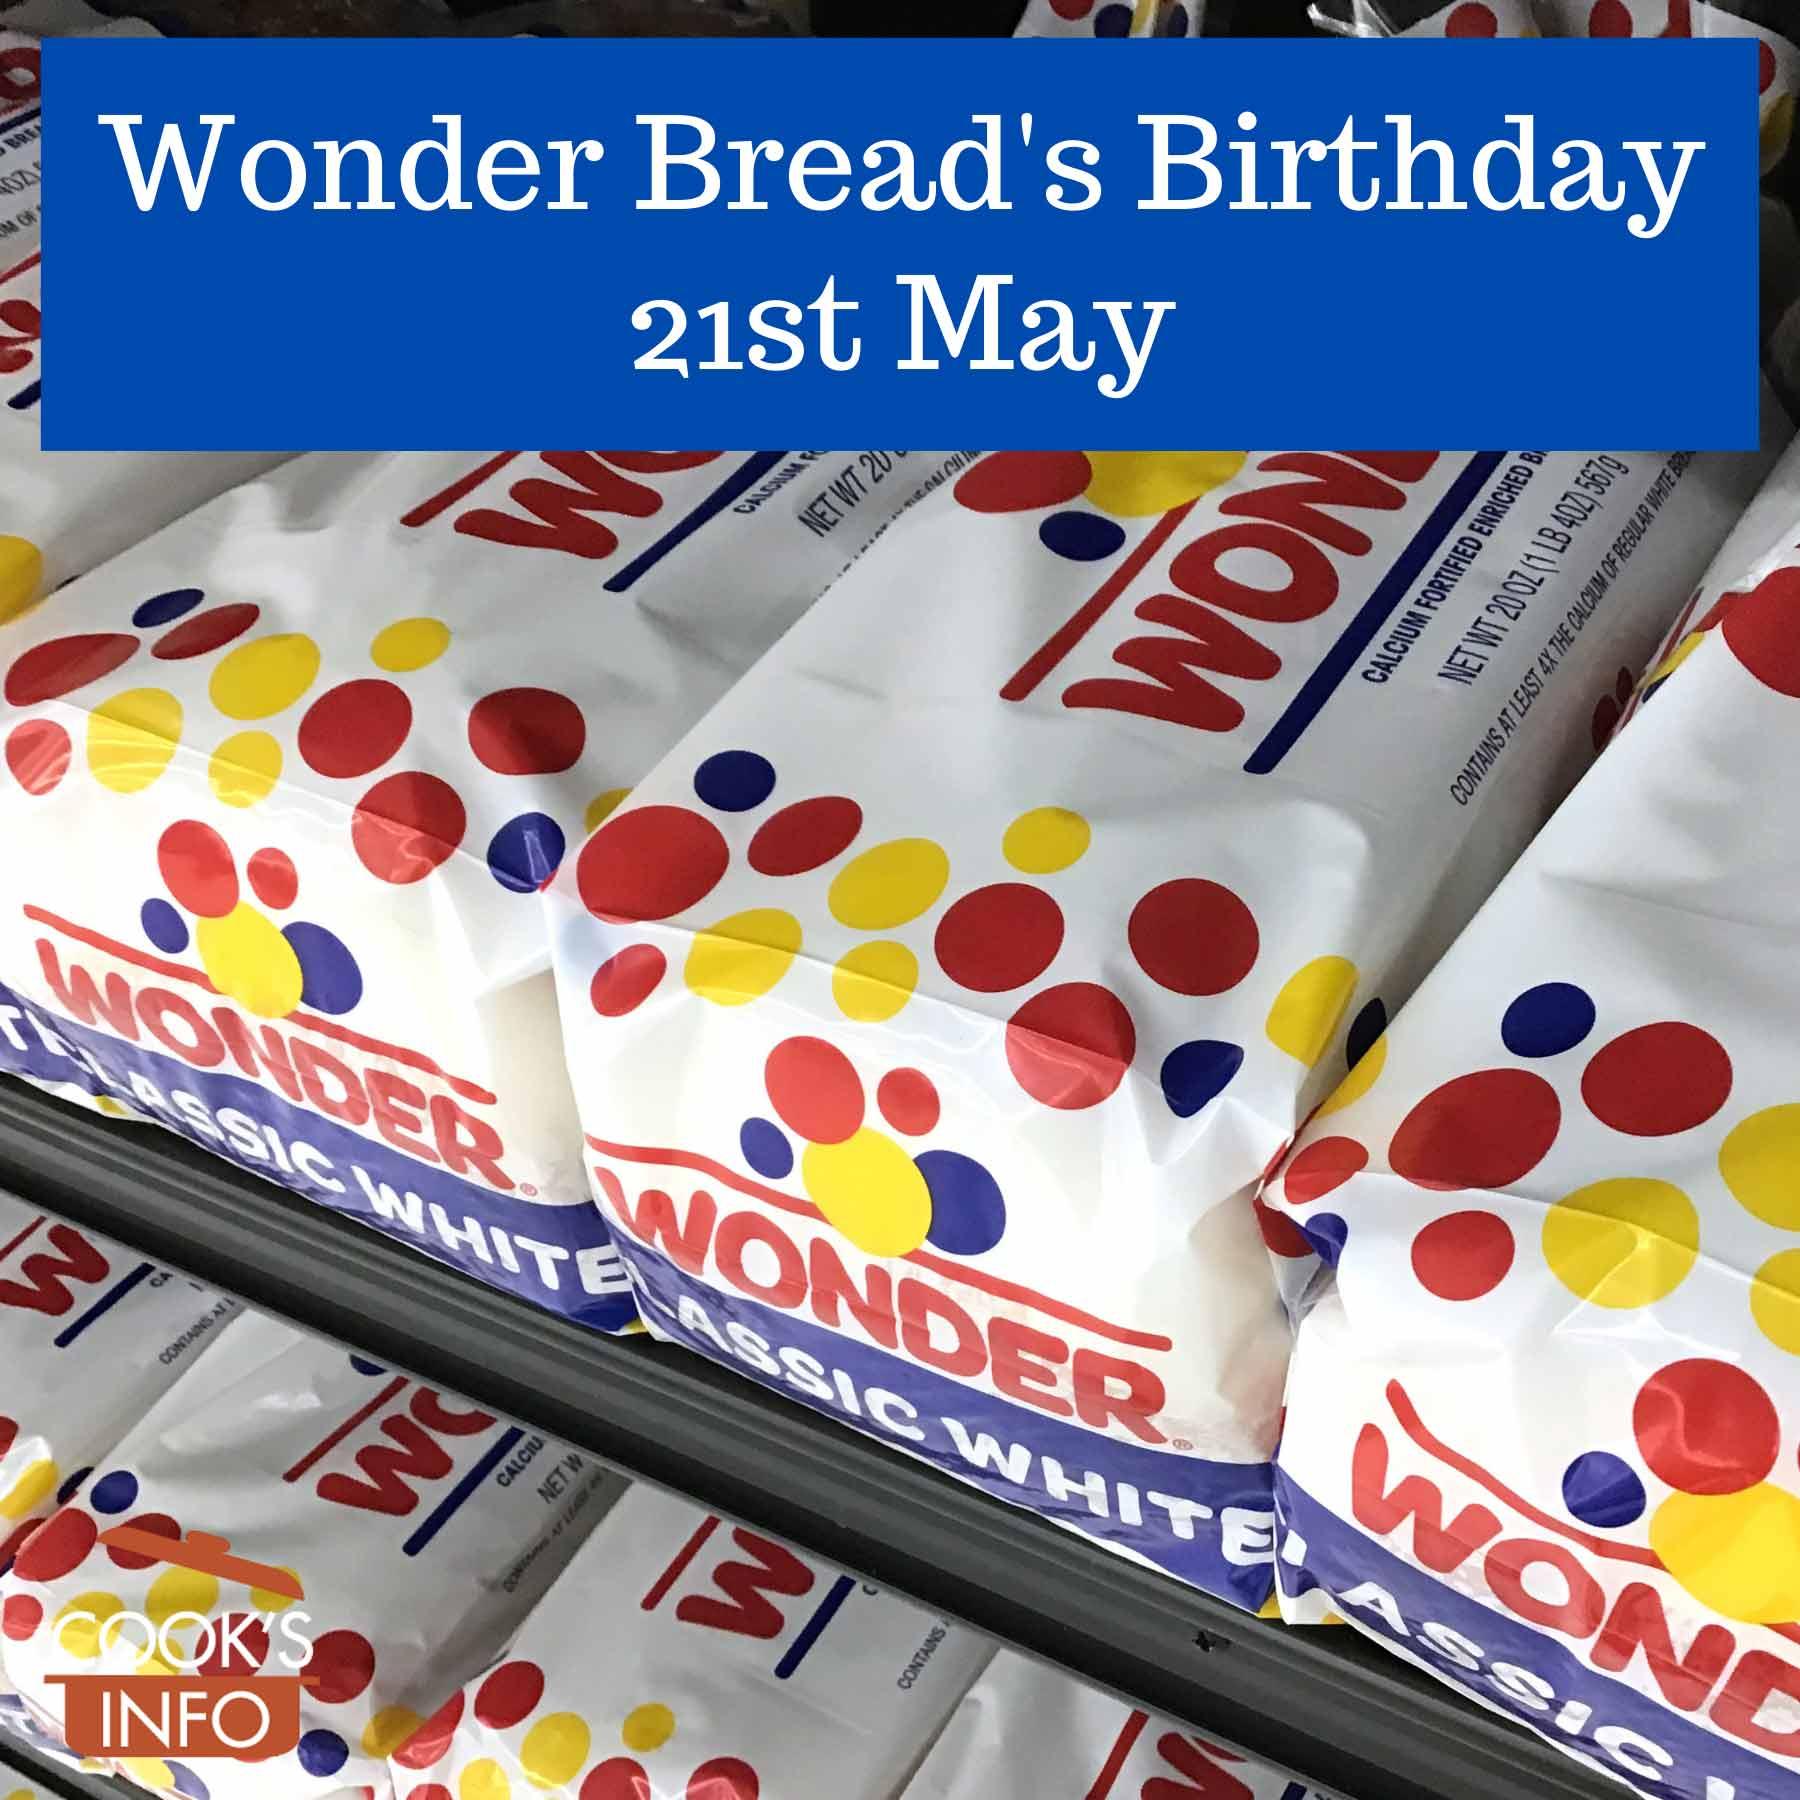 Wonder Bread on shelf